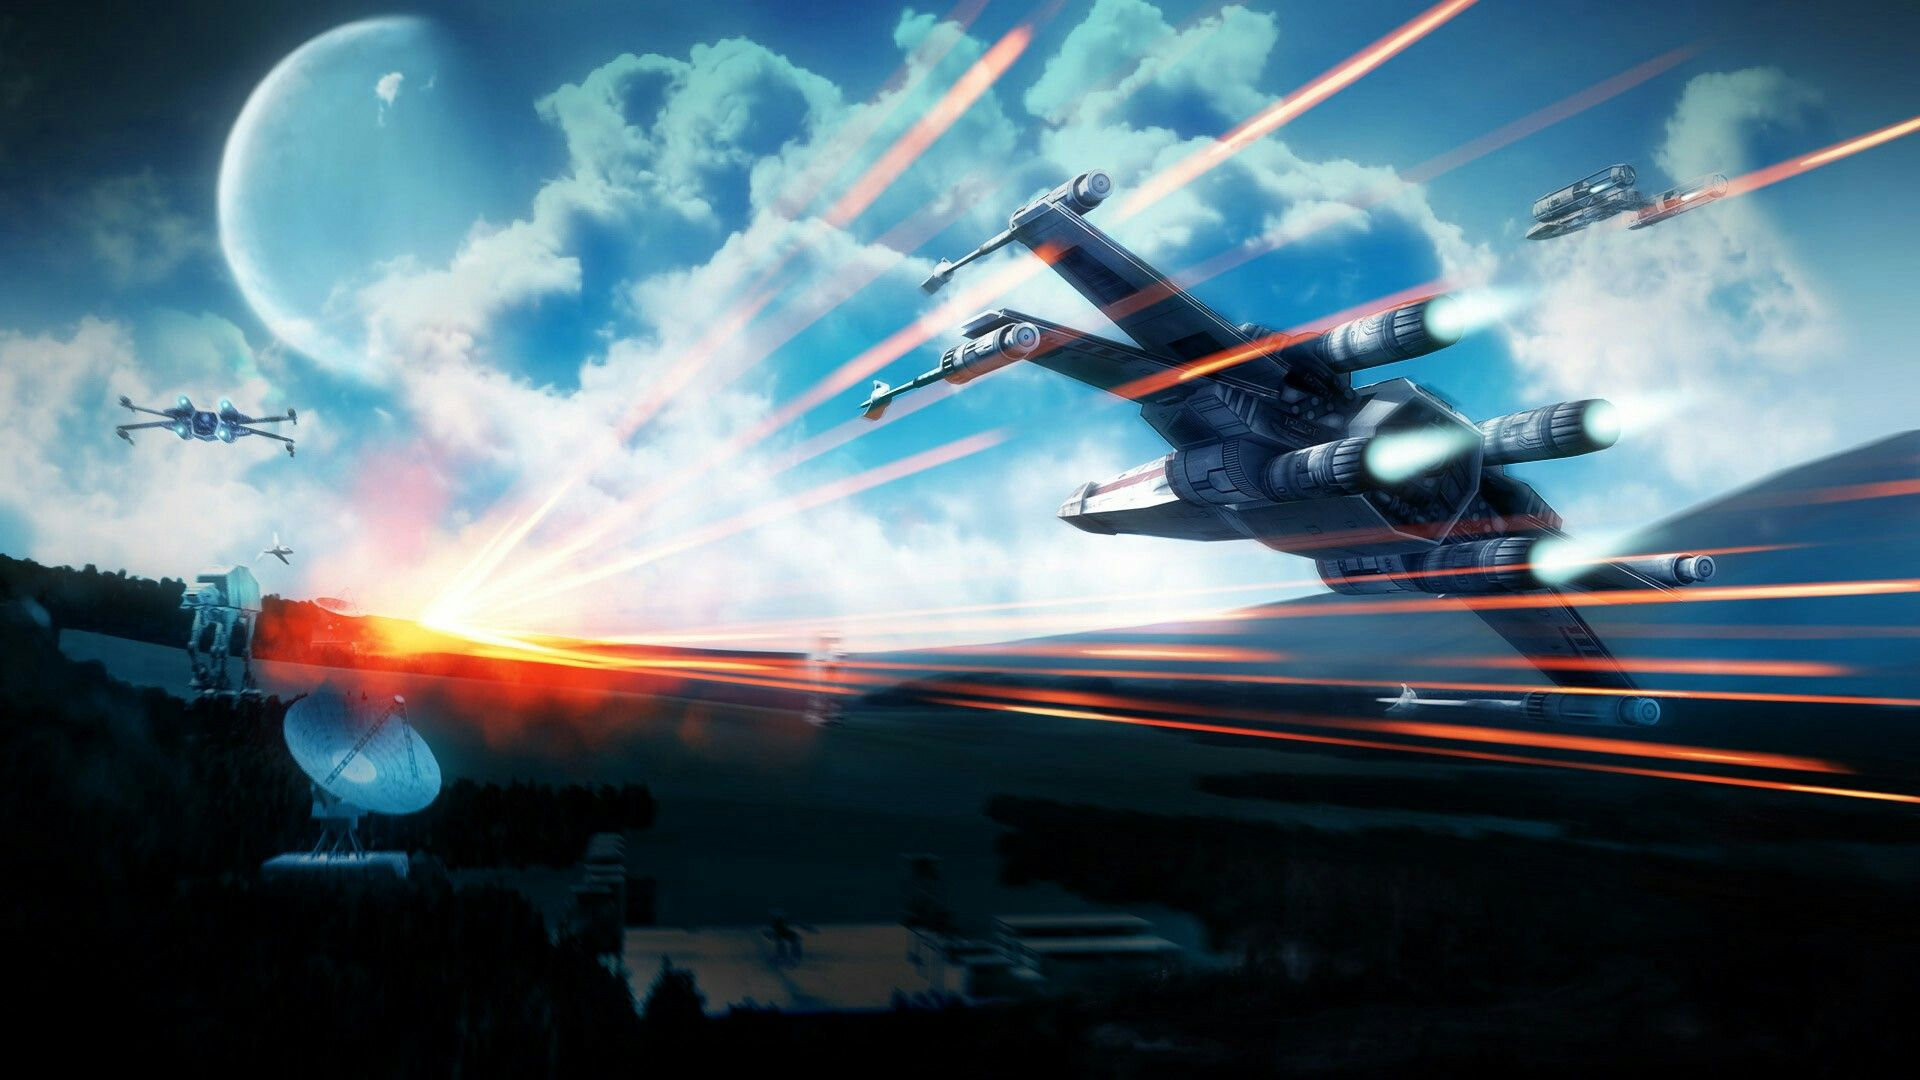 X Wing Strike Star Wars Wallpaper Star Wars Pictures Star Wars Battlefront